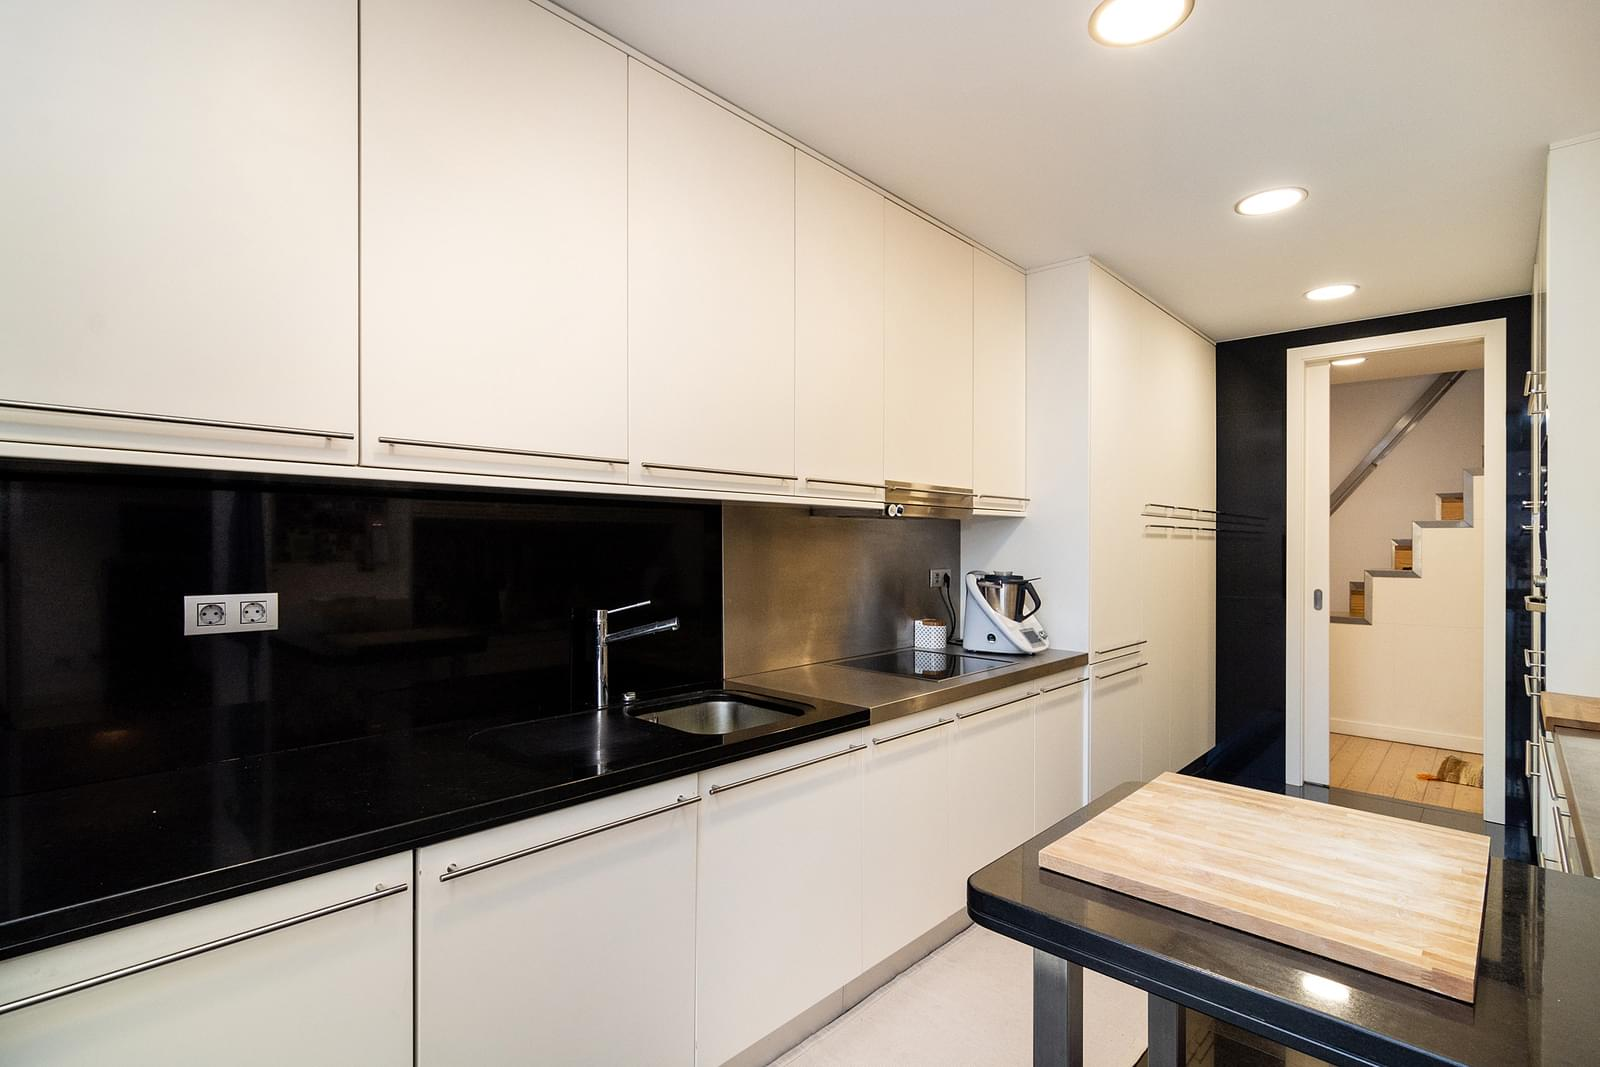 pf17626-apartamento-t6-lisboa-2b858e1b-a1a2-409b-899b-ac6968d03834